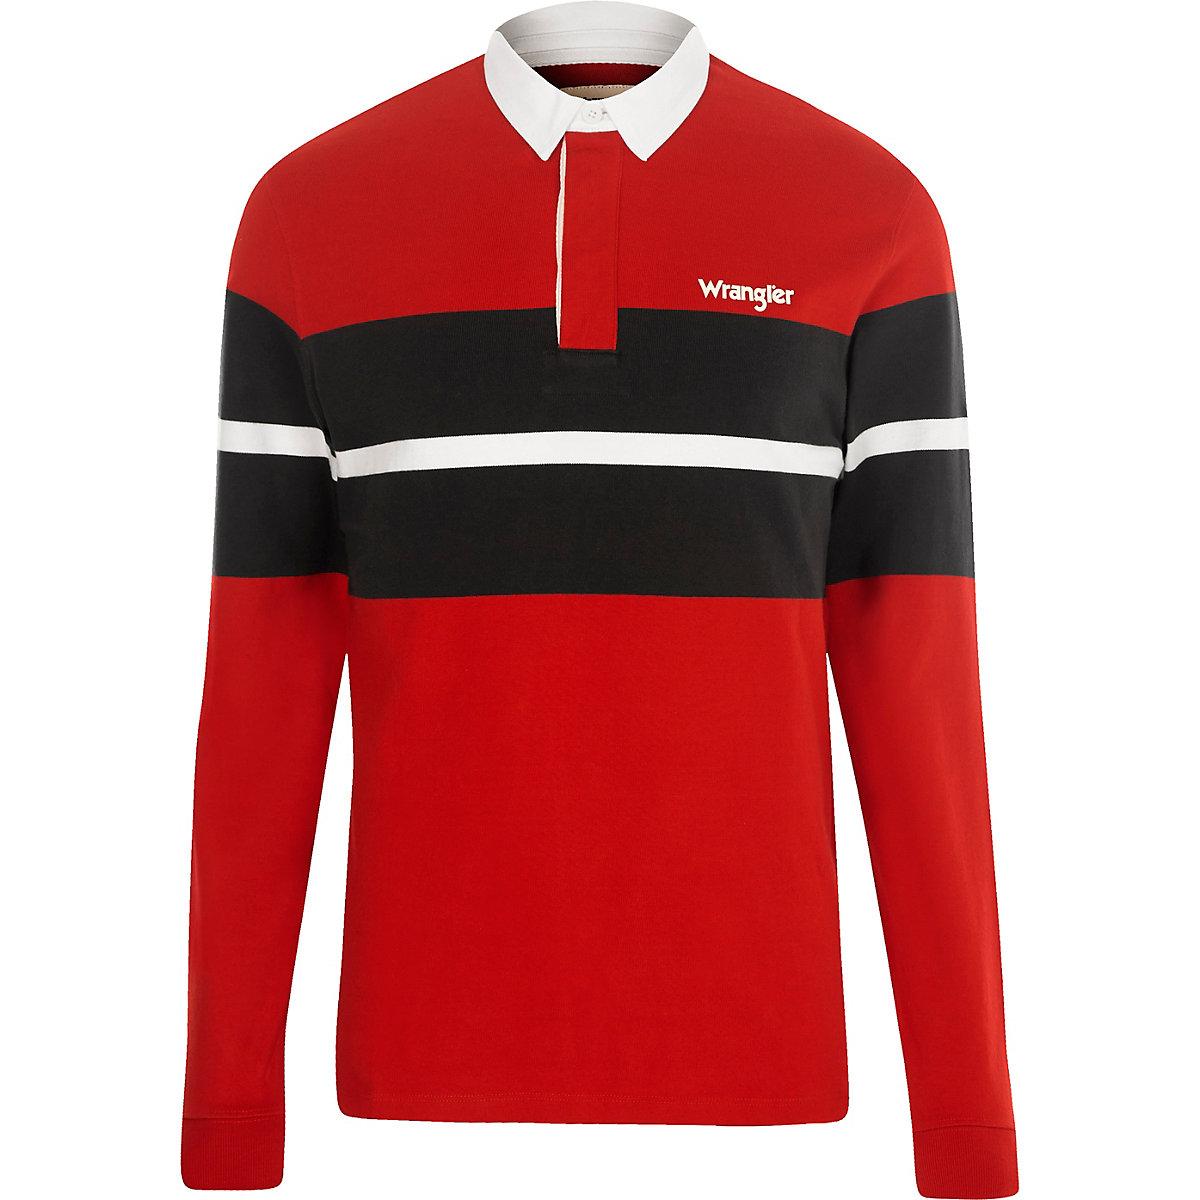 Wrangler red block long sleeve polo shirt